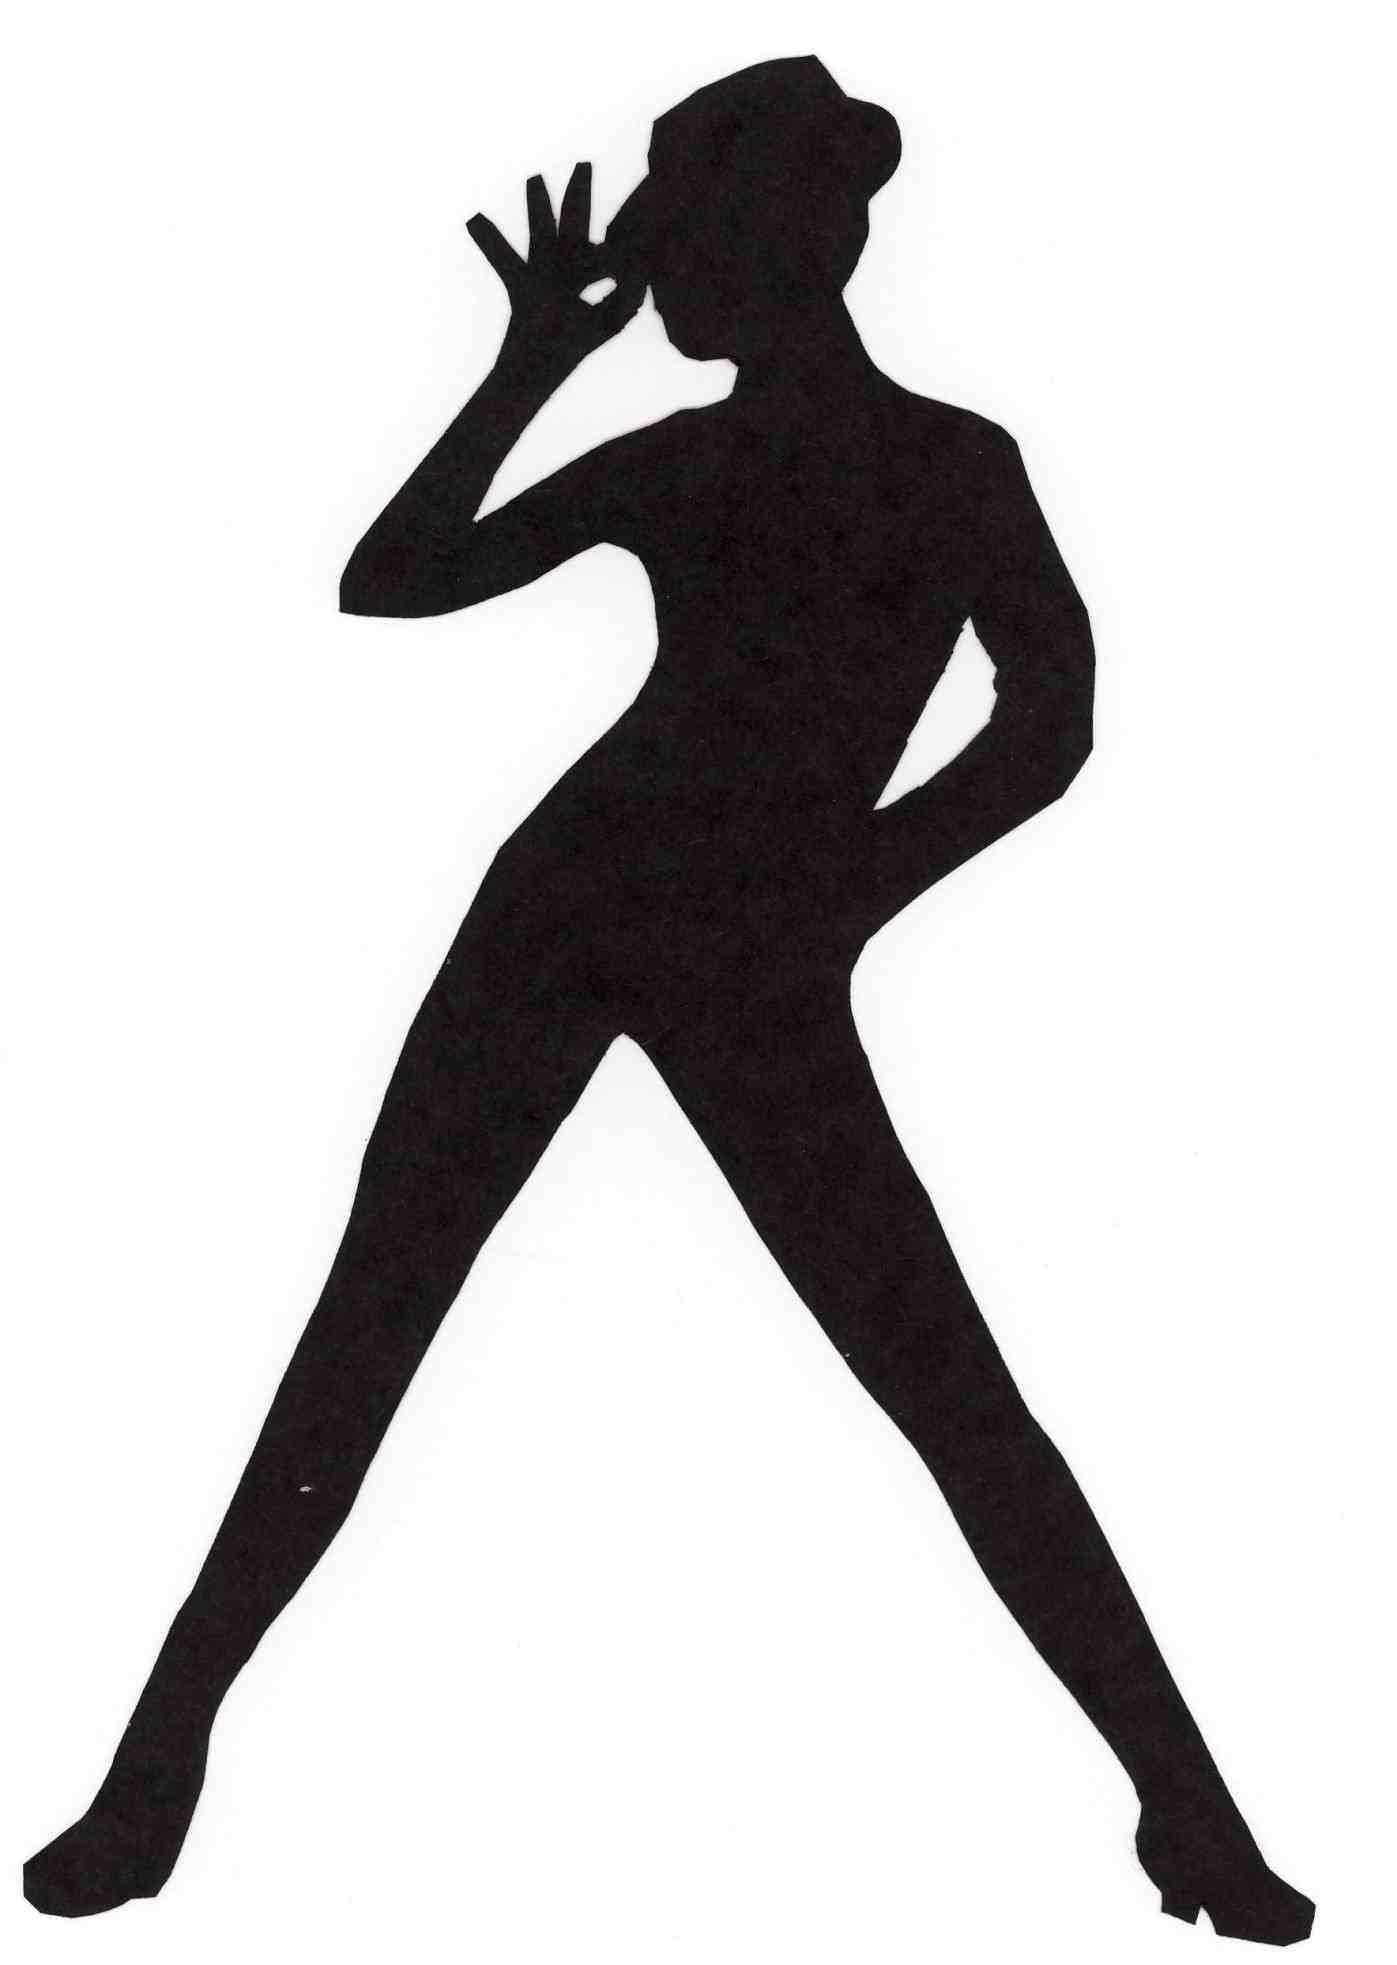 1397x1965 Dancing Shoes Silhouette